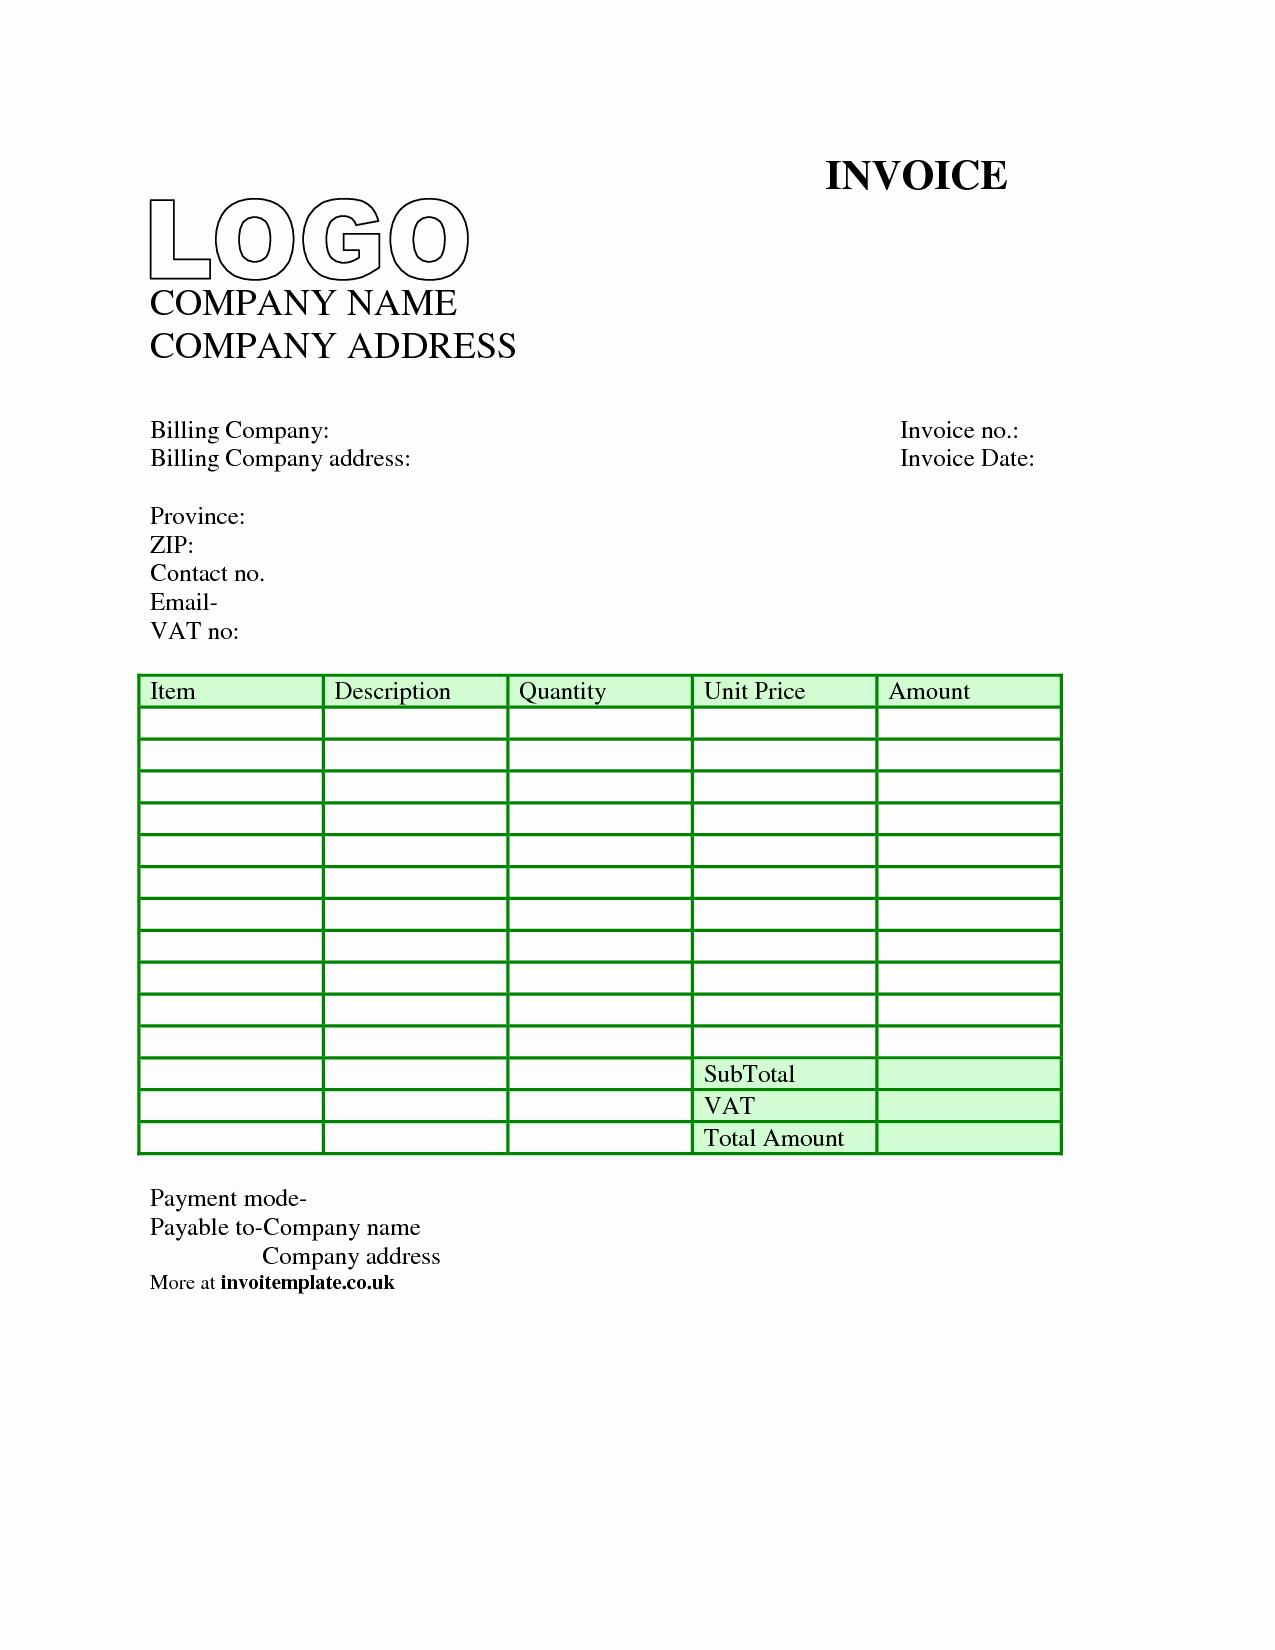 Free Blank Invoice Template Word Elegant Invoice Template Uk Word